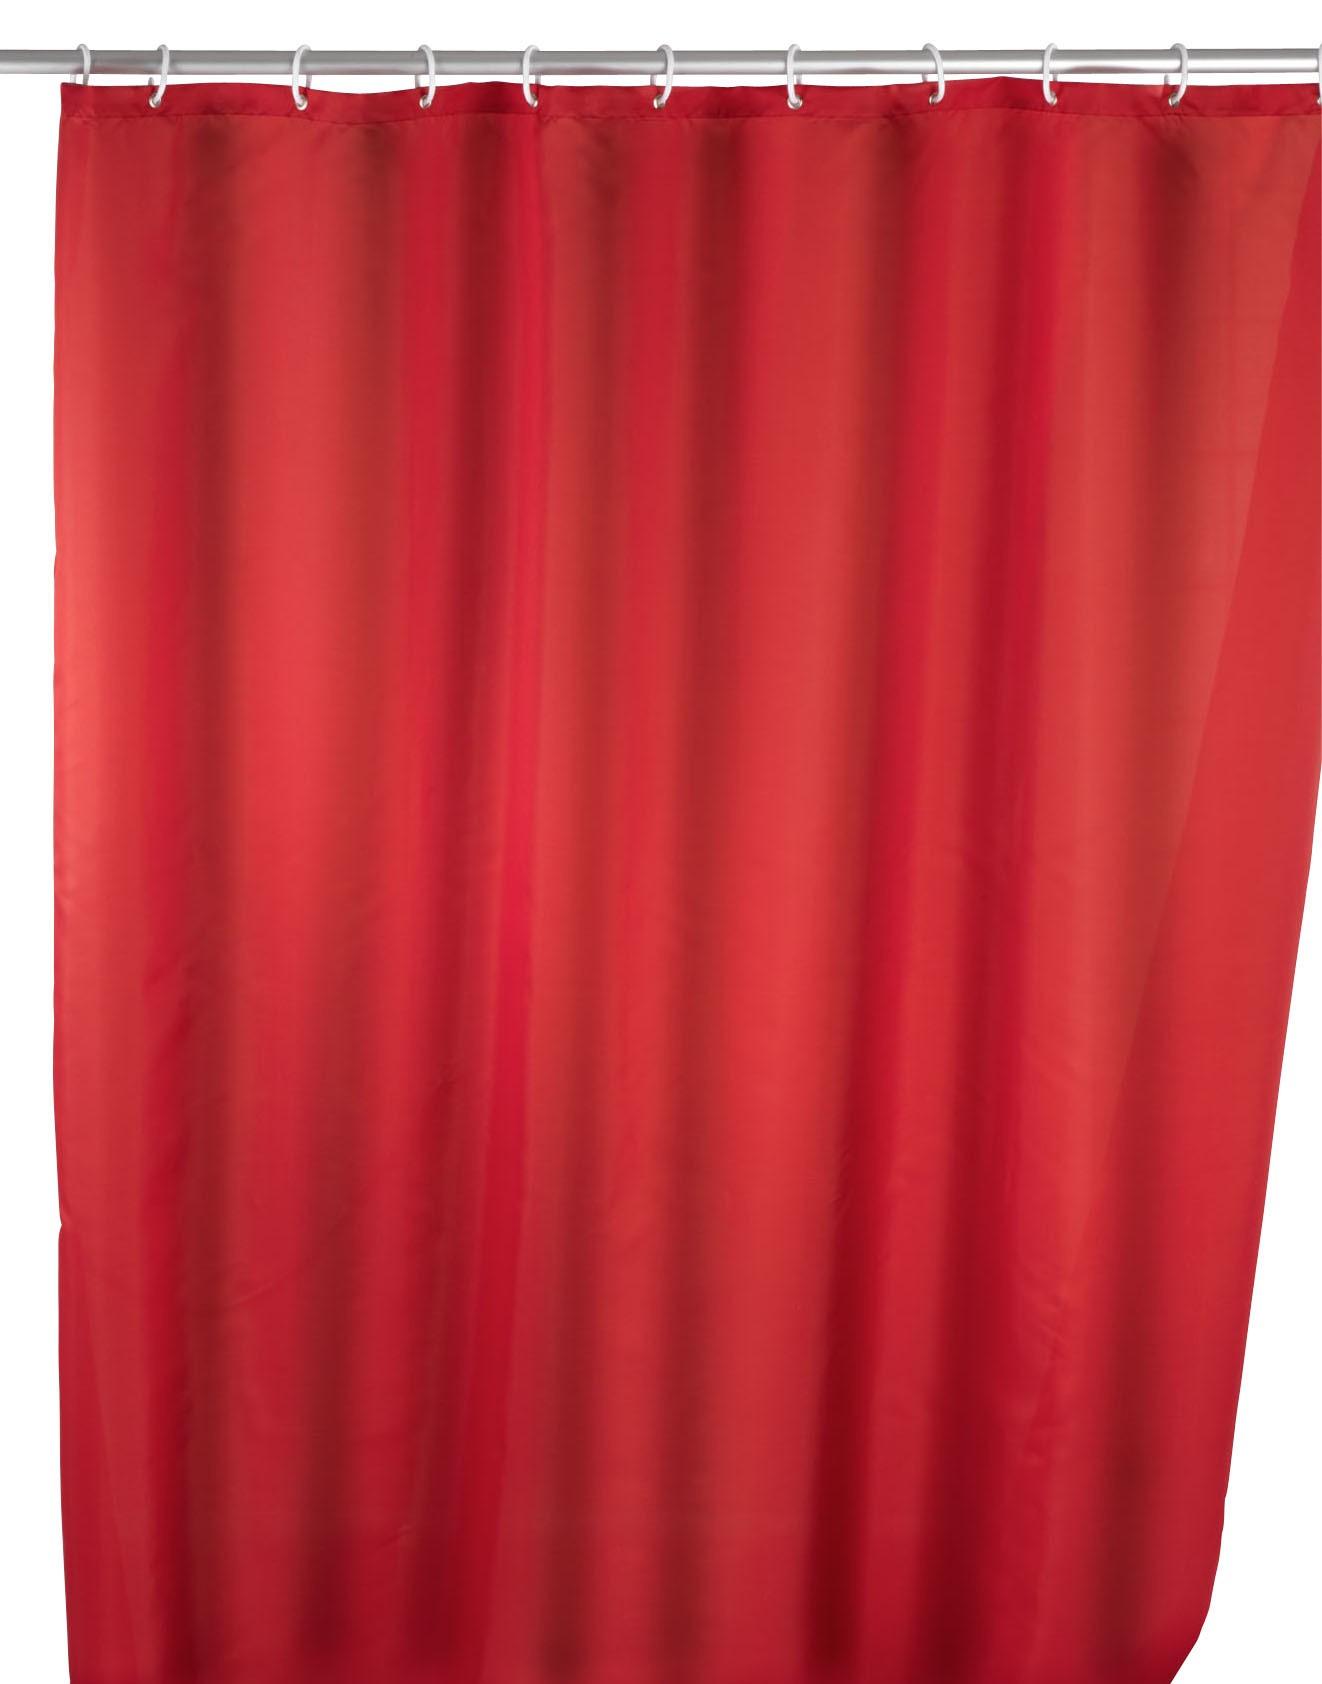 Anti-Schimmel Duschvorhang Uni Red, 180 x 200 cm, waschbar